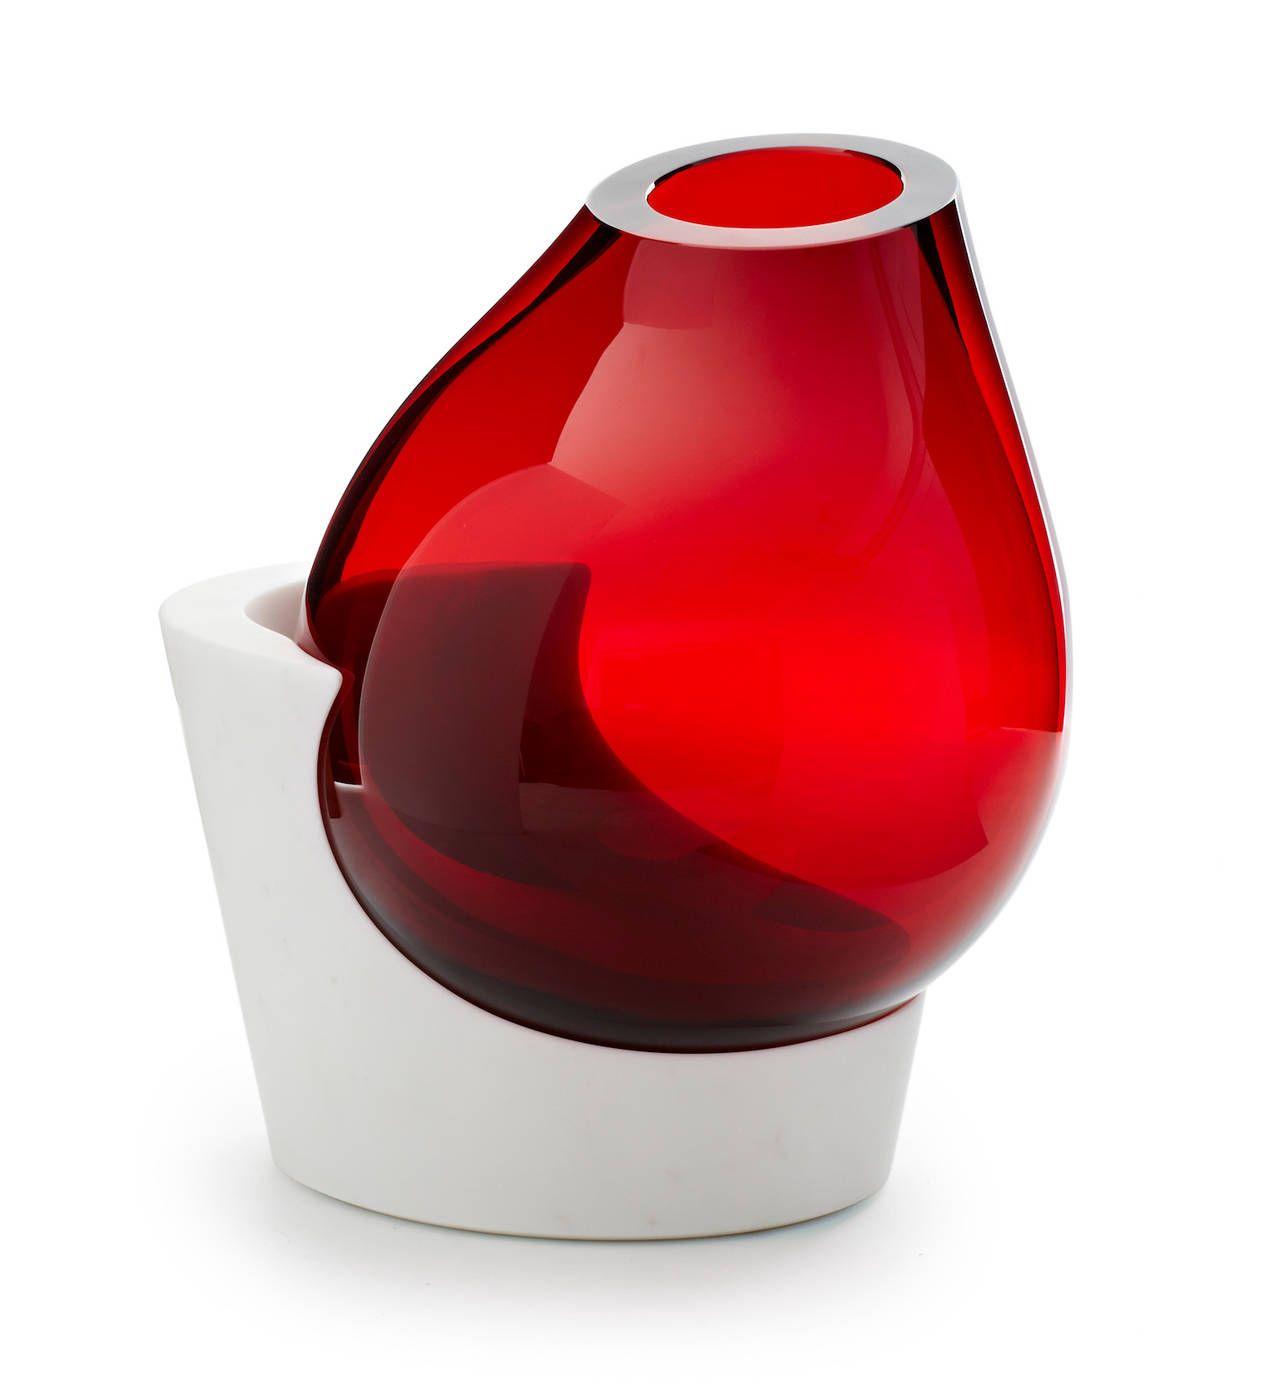 Osmosi vases image 2